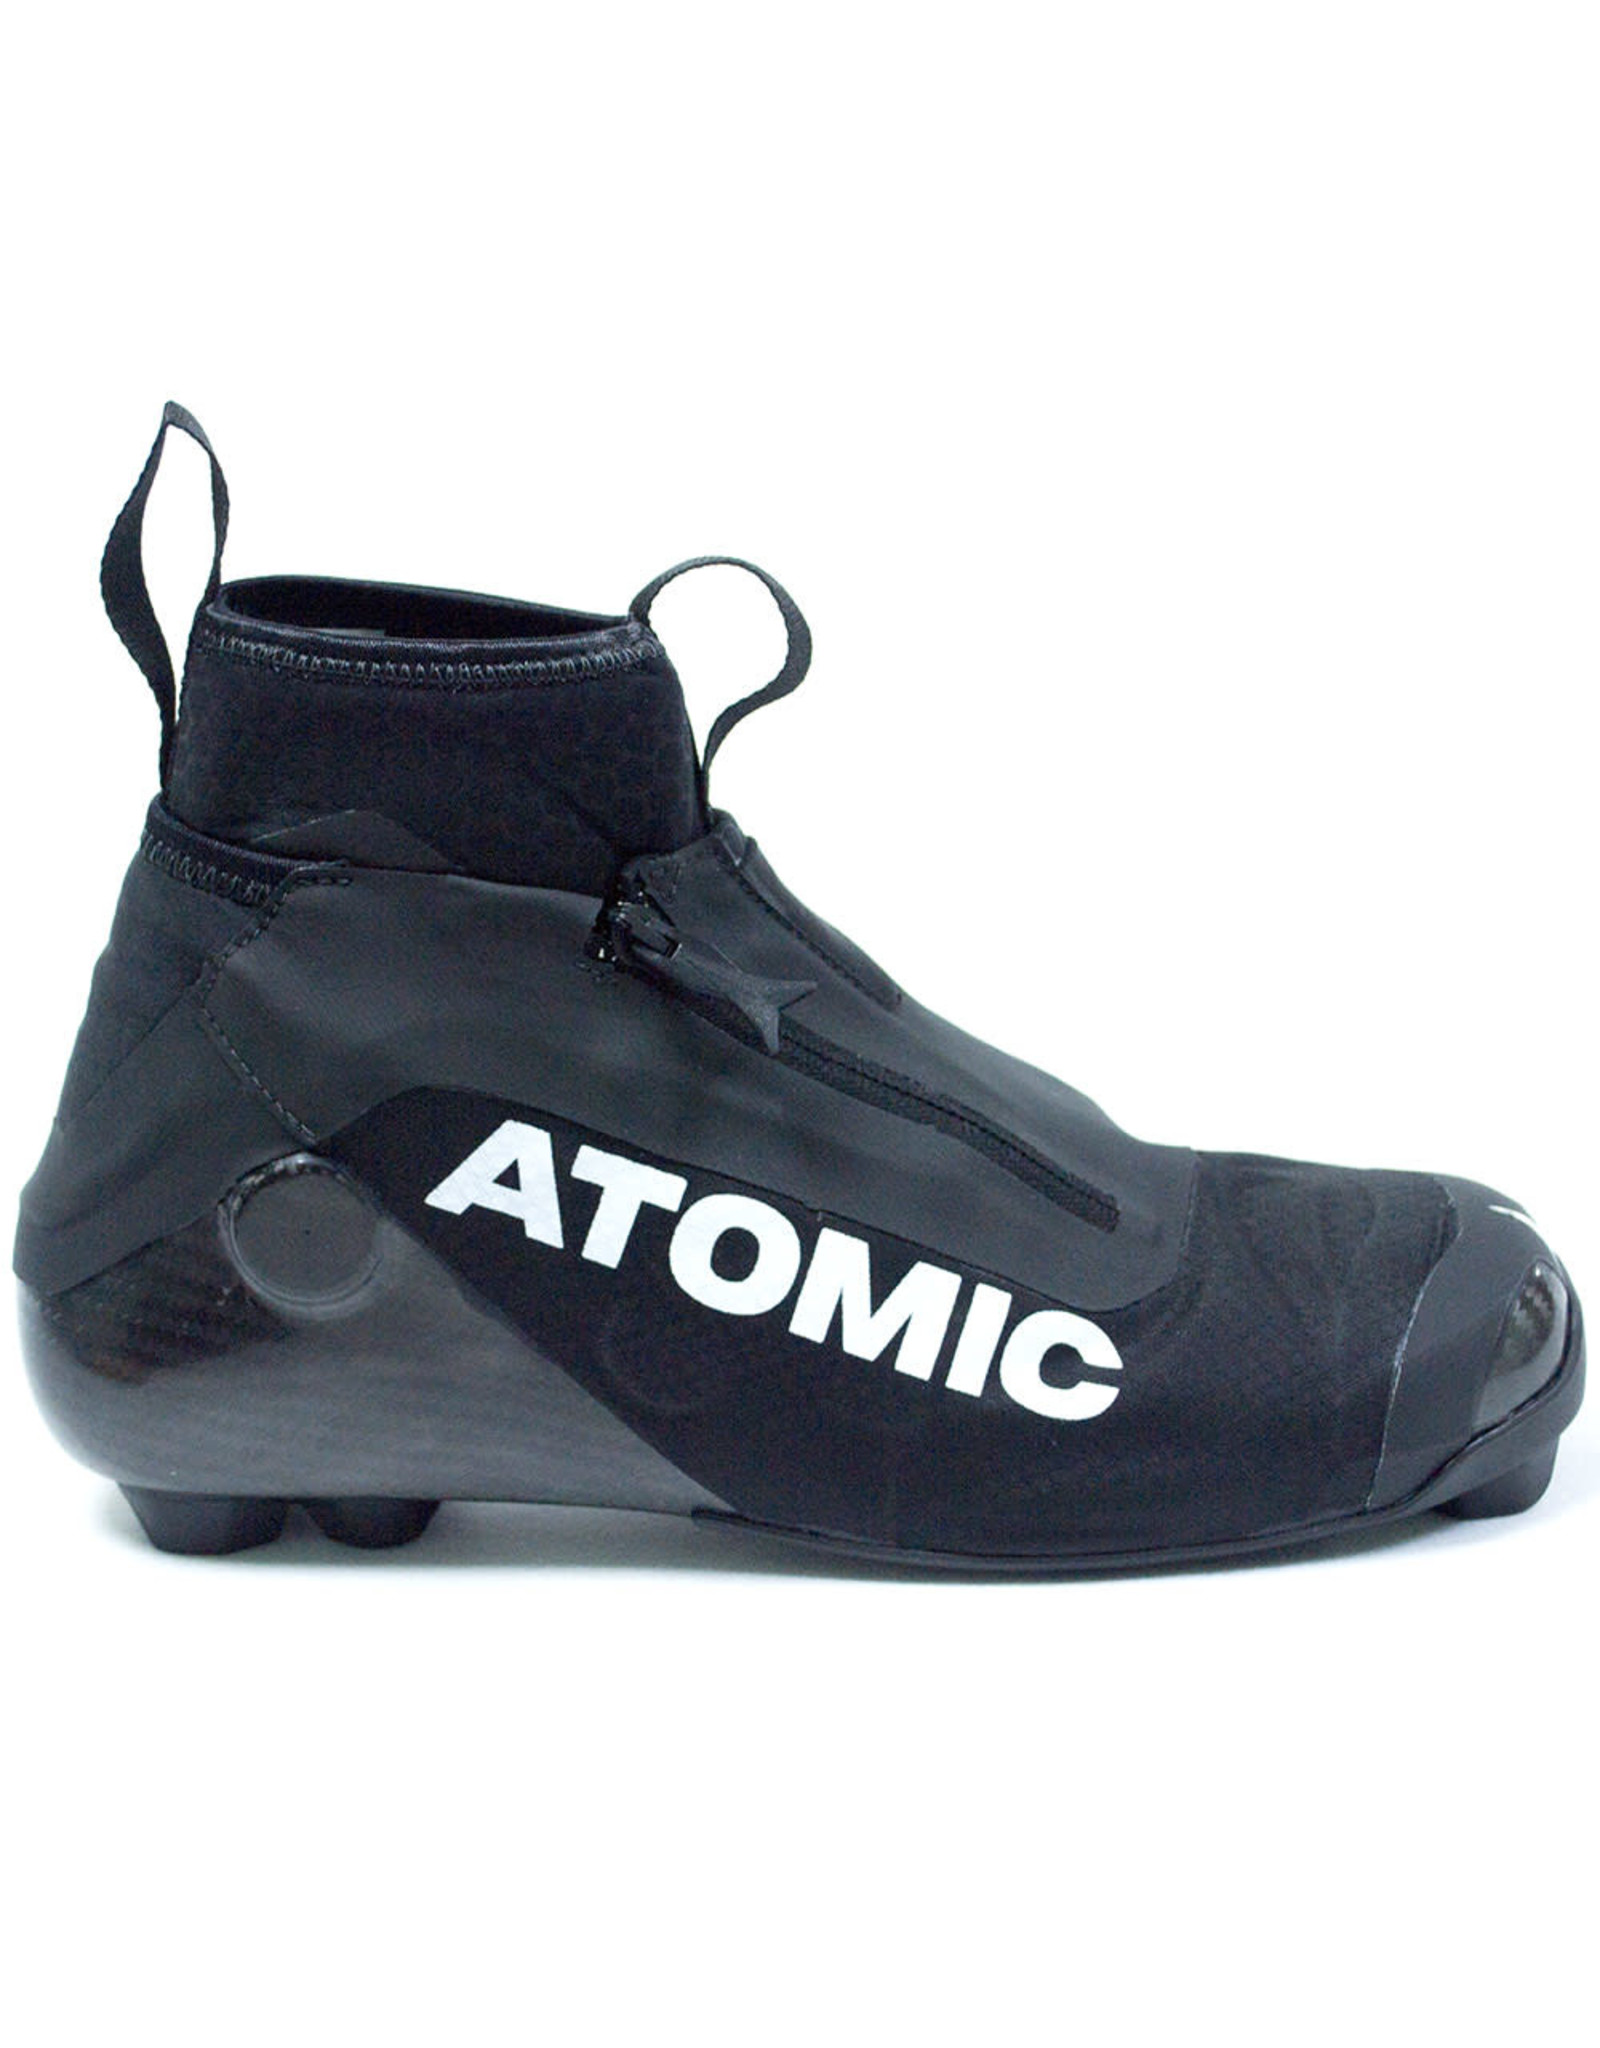 Atomic Atomic Redster Carbon Classic Racer Boot